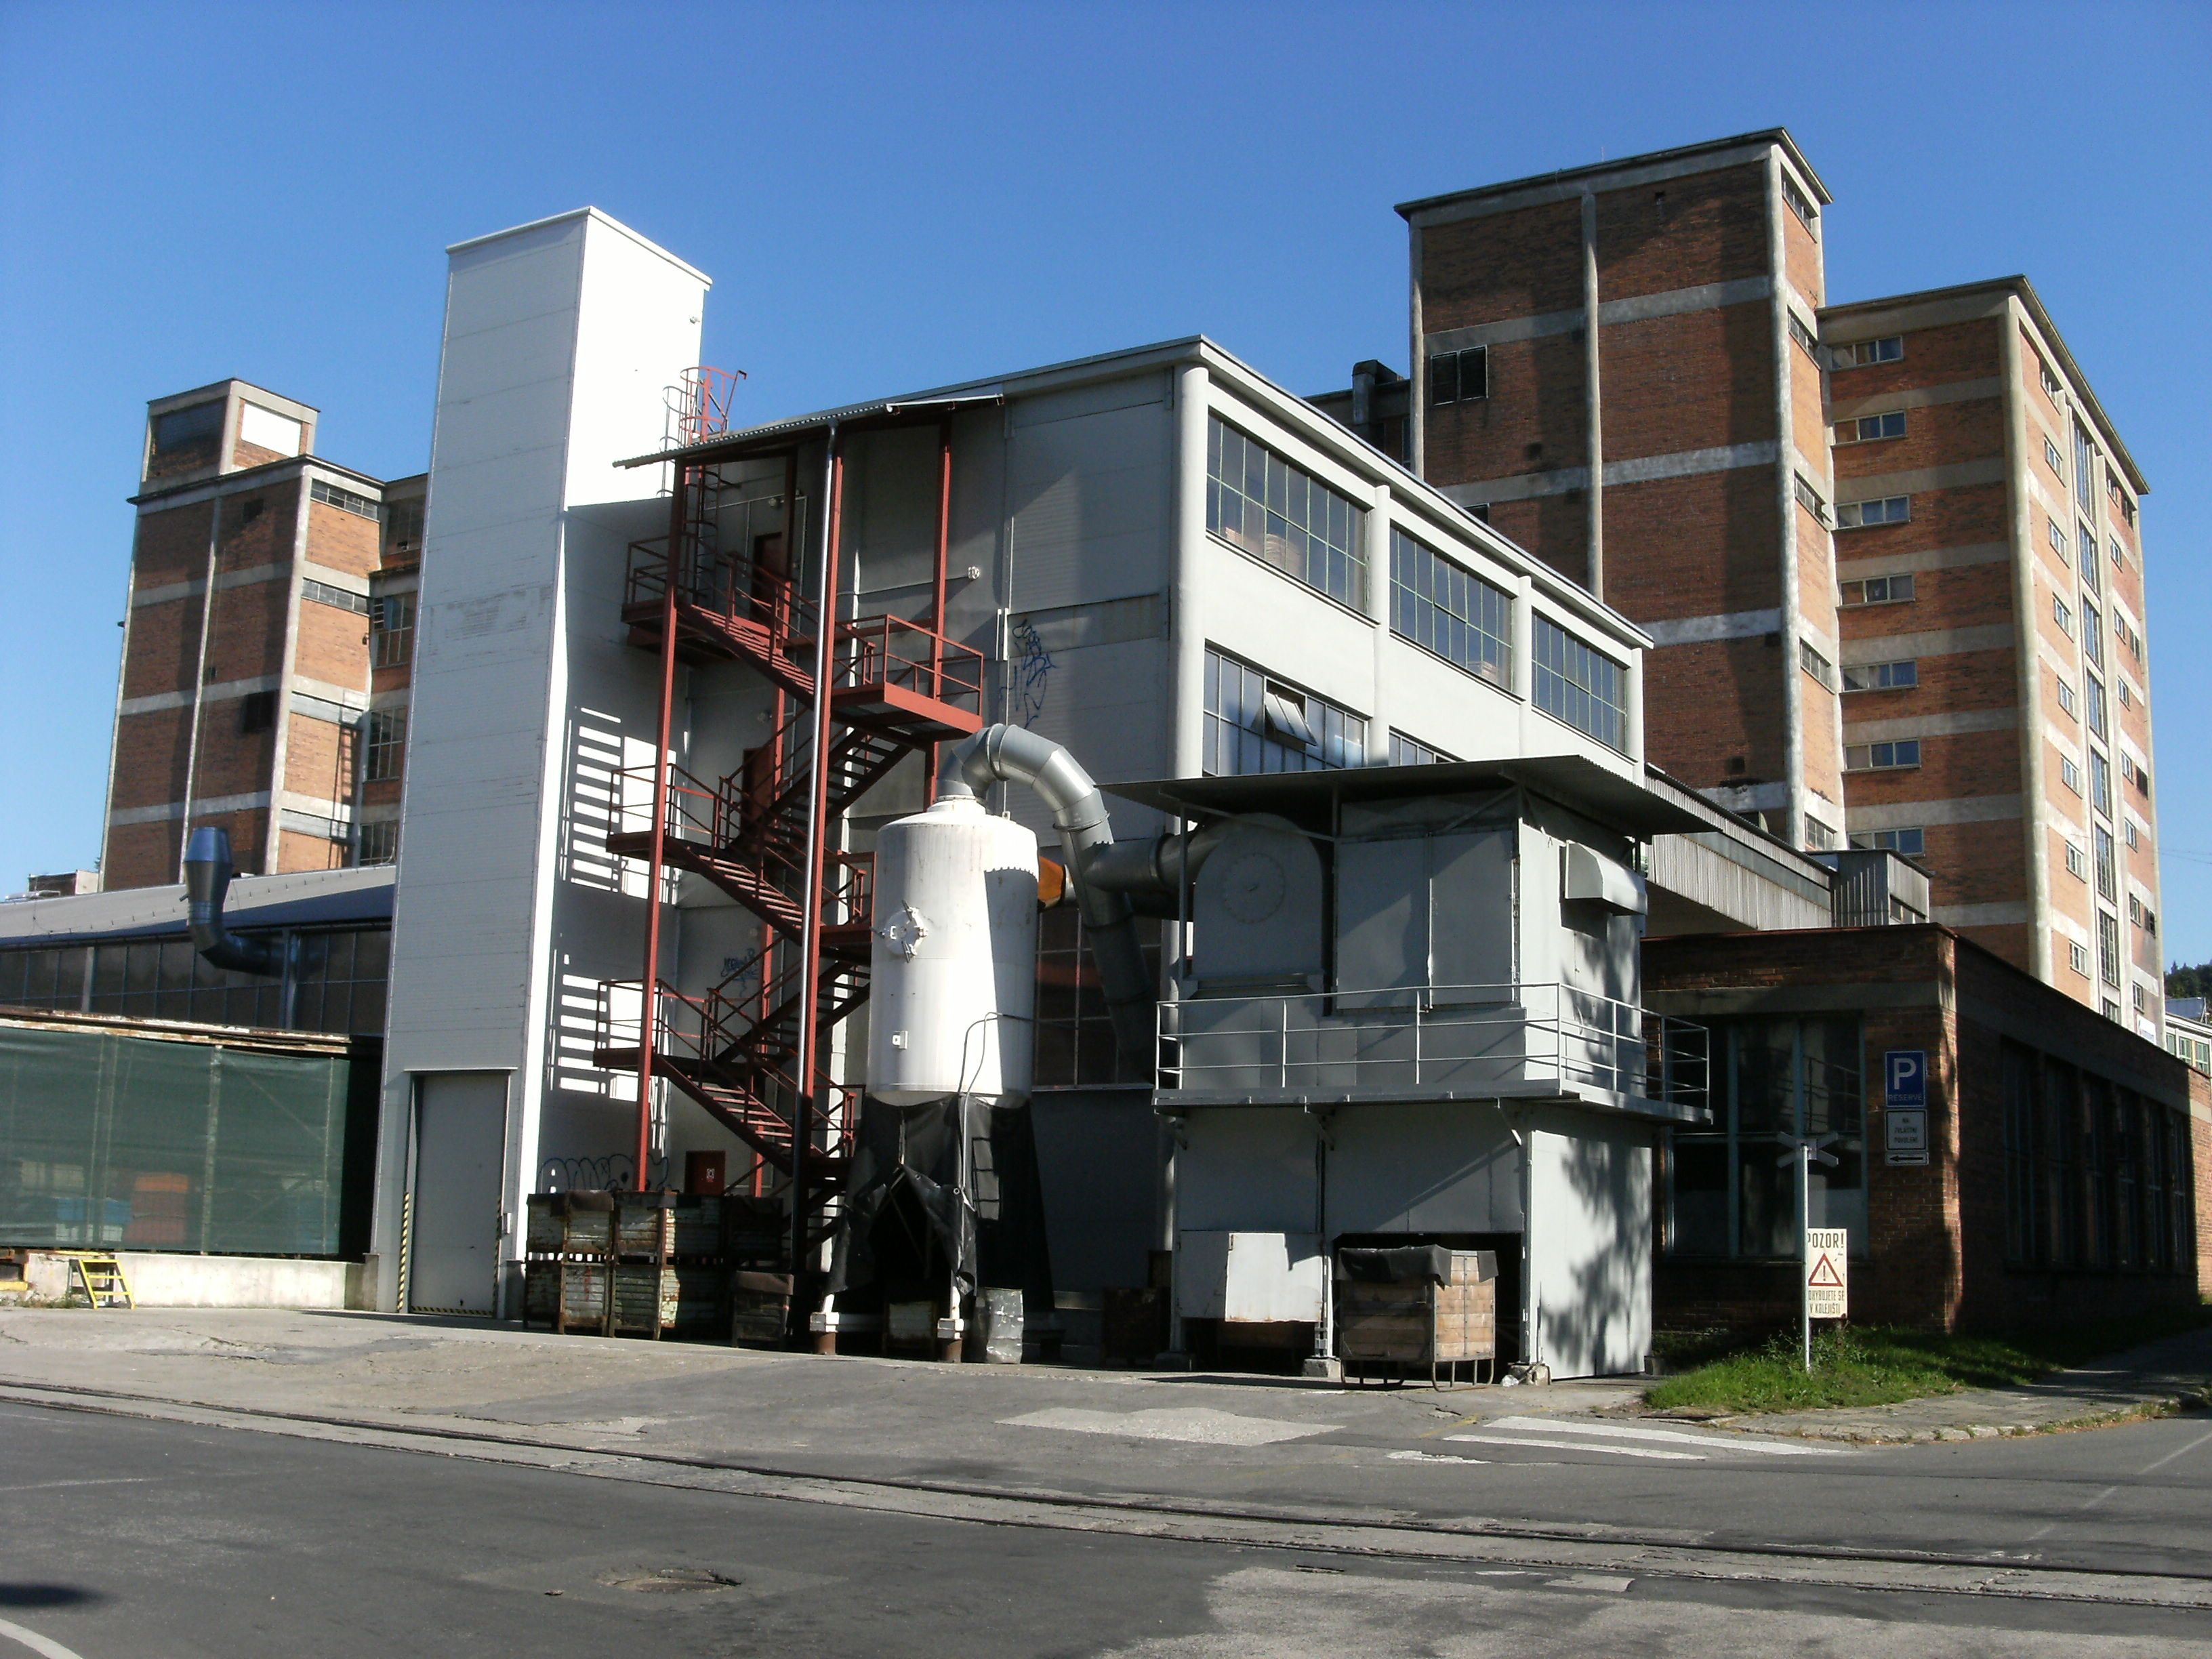 Home Design Zlín Part - 33: [ Image Gallery Industrial Architecture ] - Best Free Home Design Idea U0026  Inspiration